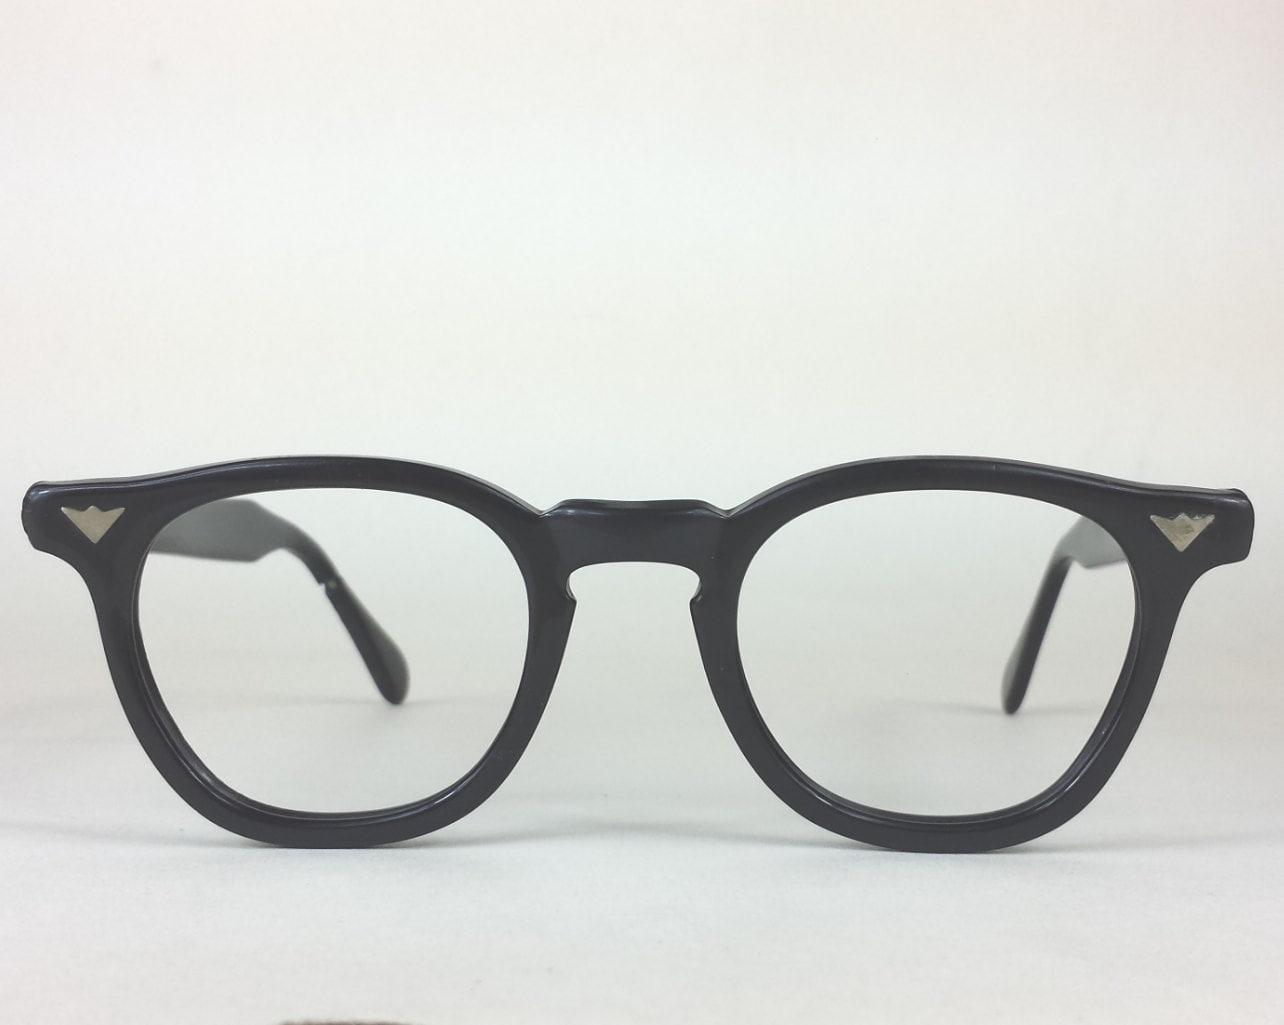 Eyeglass Frames Baltimore : Zyl Craft Lord Baltimore Optical 1950 s eyeglasses 44 24 ...